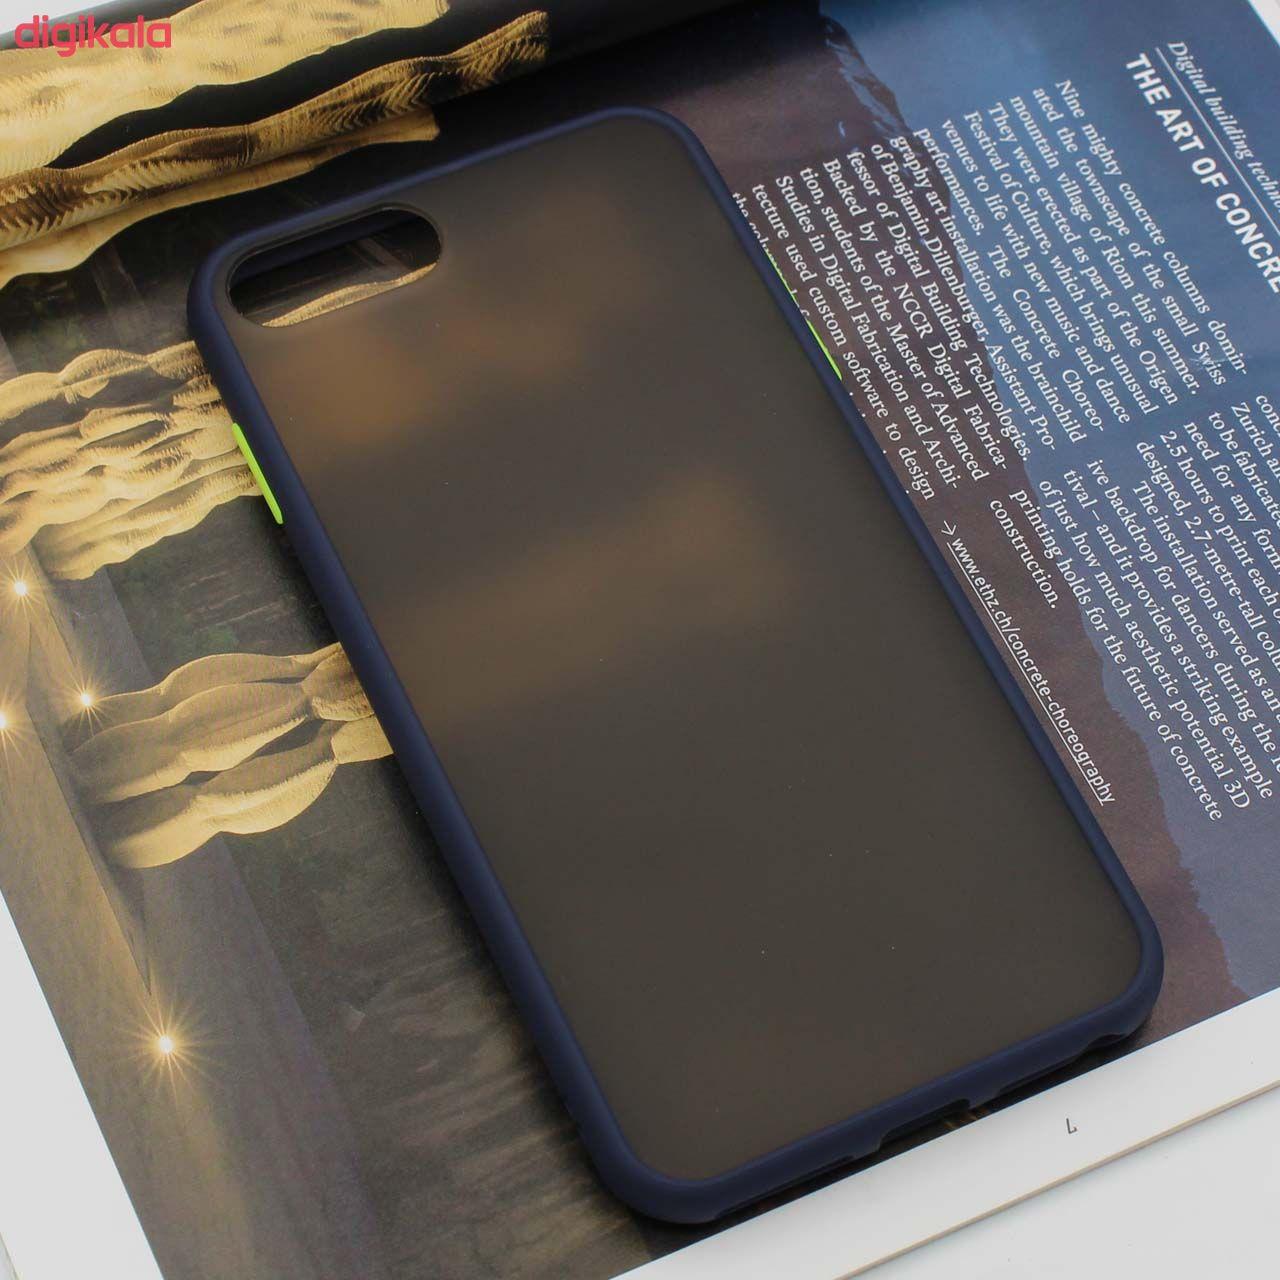 کاور کینگ پاور مدل M21 مناسب برای گوشی موبایل اپل iPhone 7 Plus/ 8 Plus main 1 5